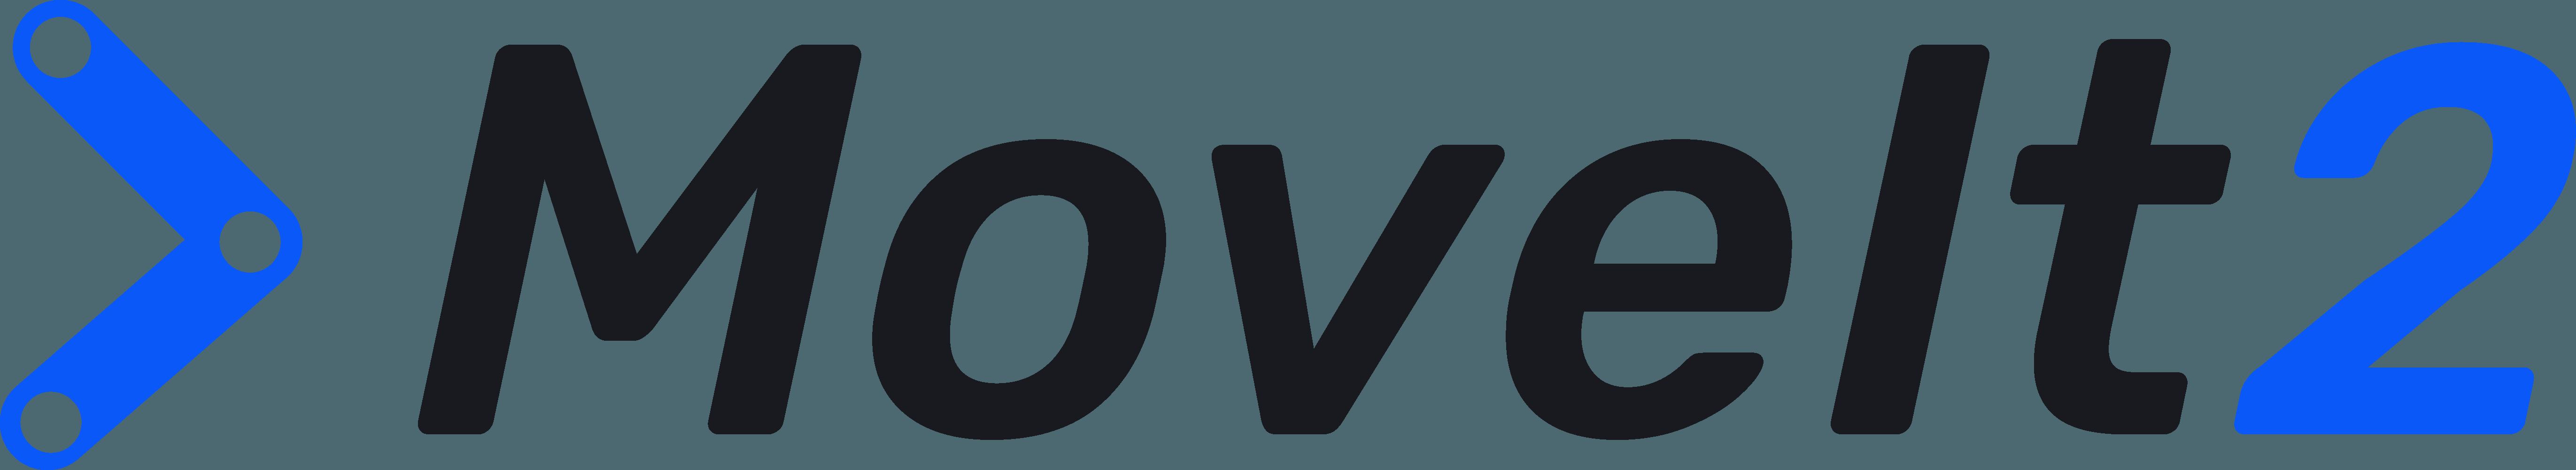 MoveIt 2 Logo